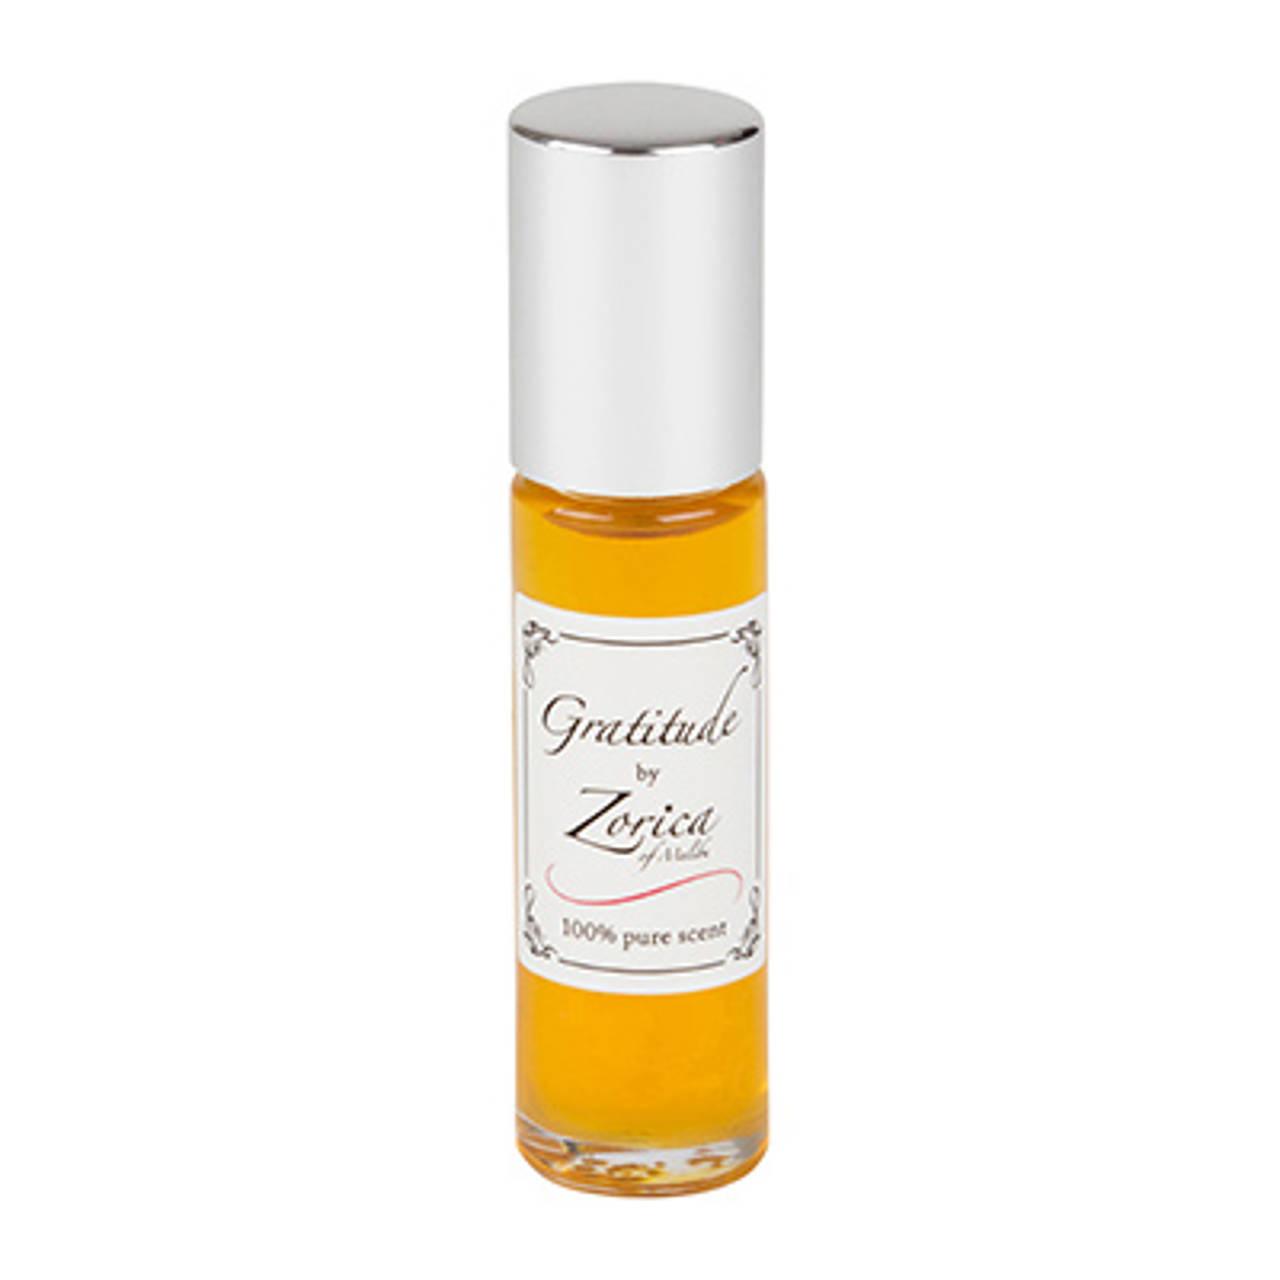 Gratitude Pure Perfume